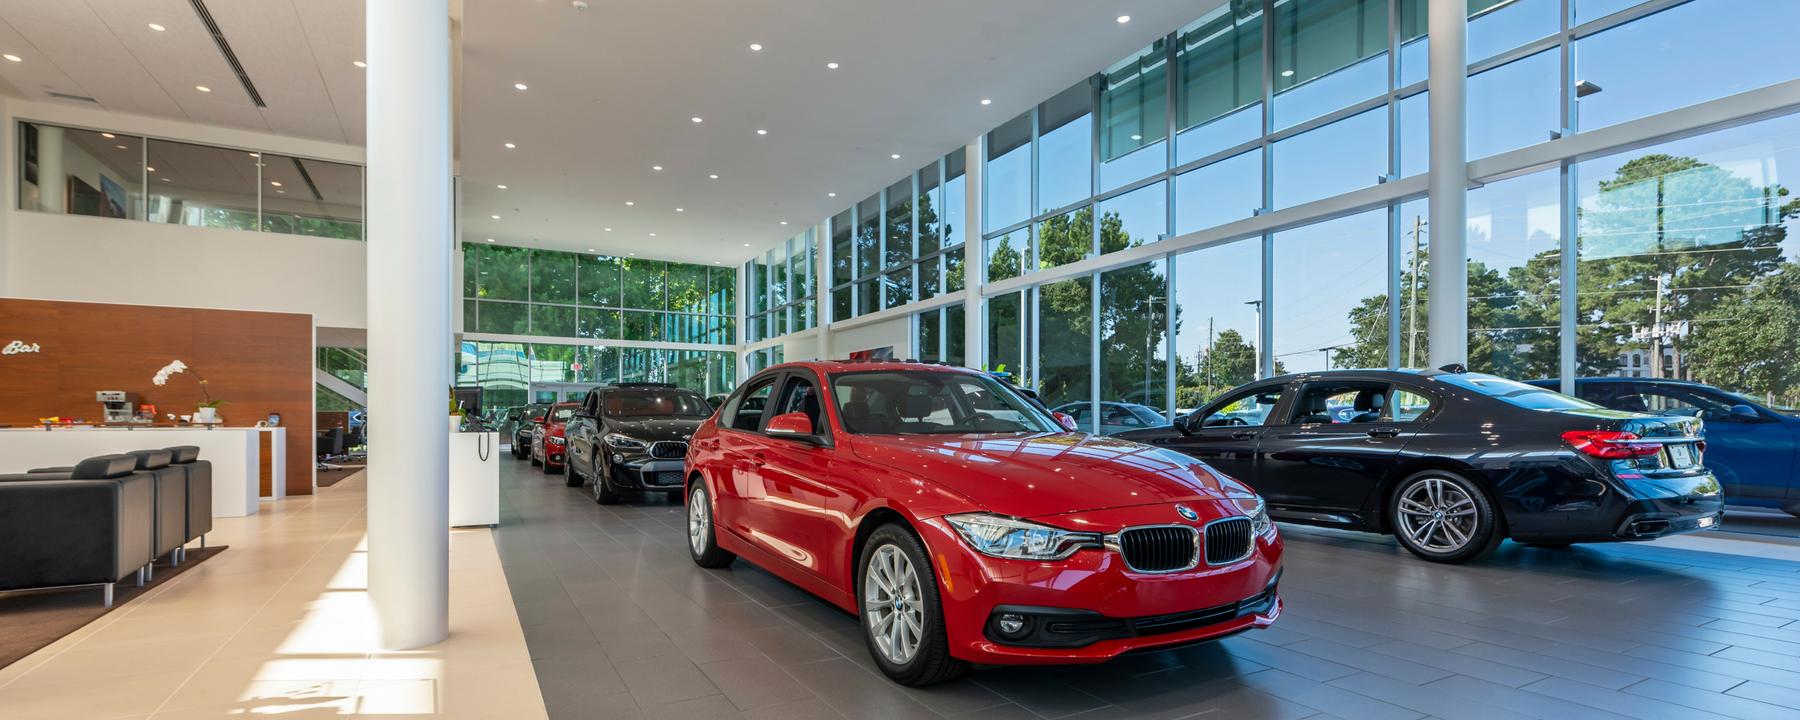 BMWWilmington_Interior_NewShowroom